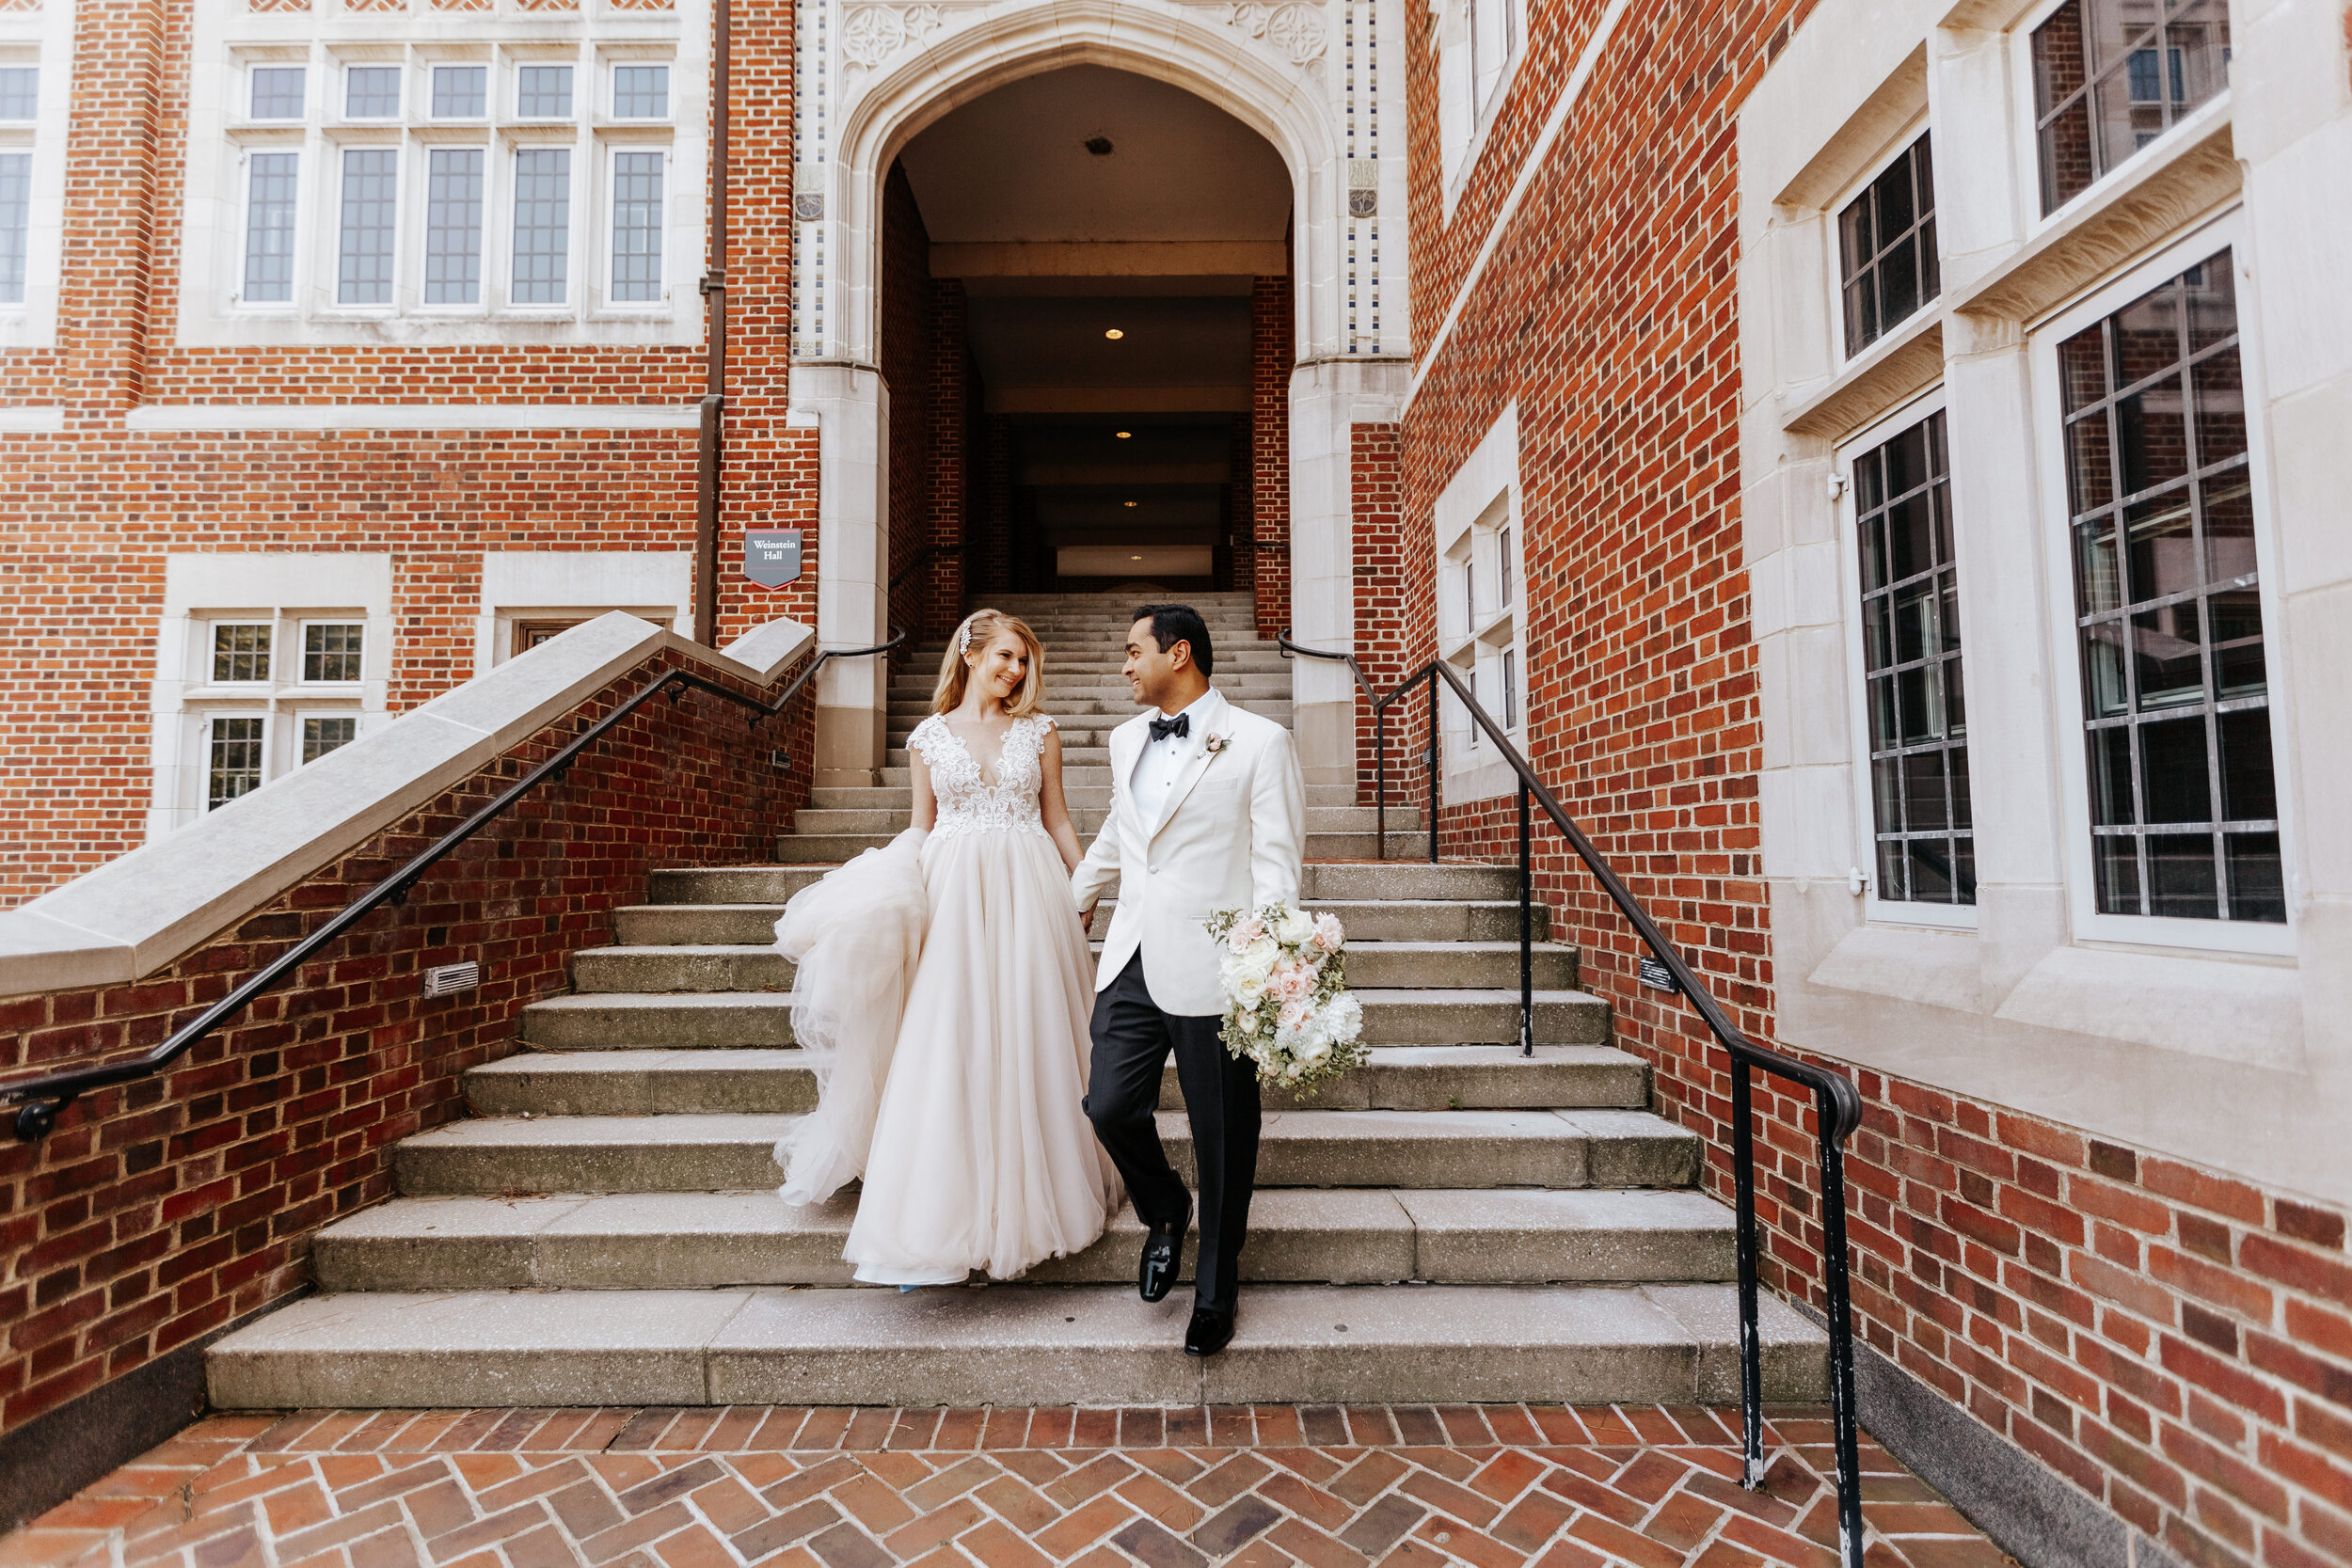 Cassie-Mrunal-Wedding-Quirk-Hotel-John-Marshall-Ballrooms-Richmond-Virginia-Photography-by-V-51.jpg